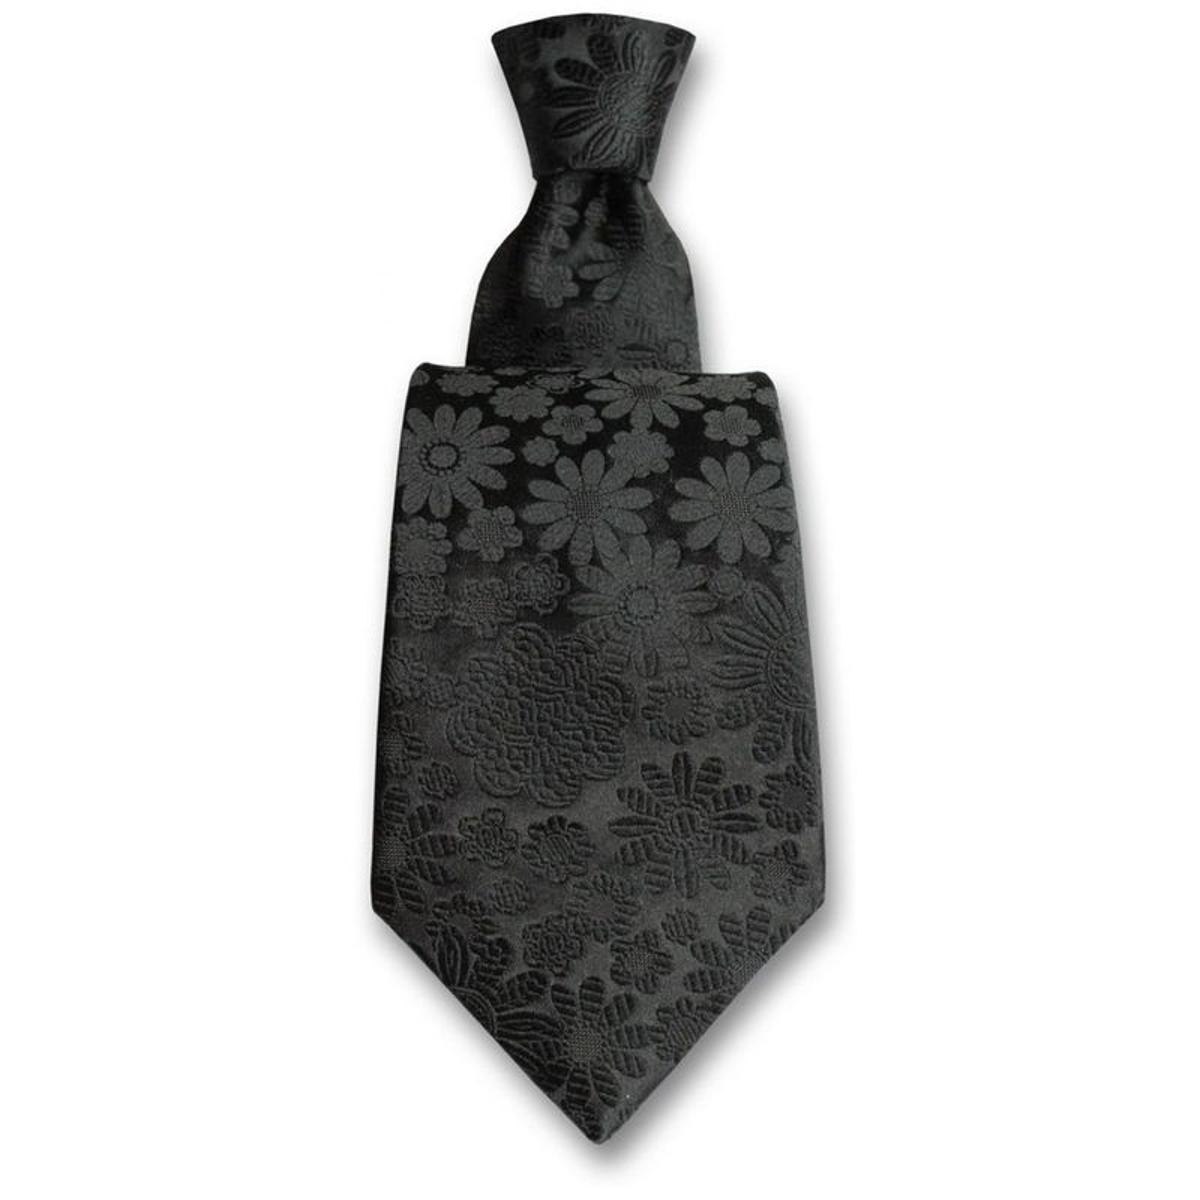 Cravate Pisa. Soie Motifs